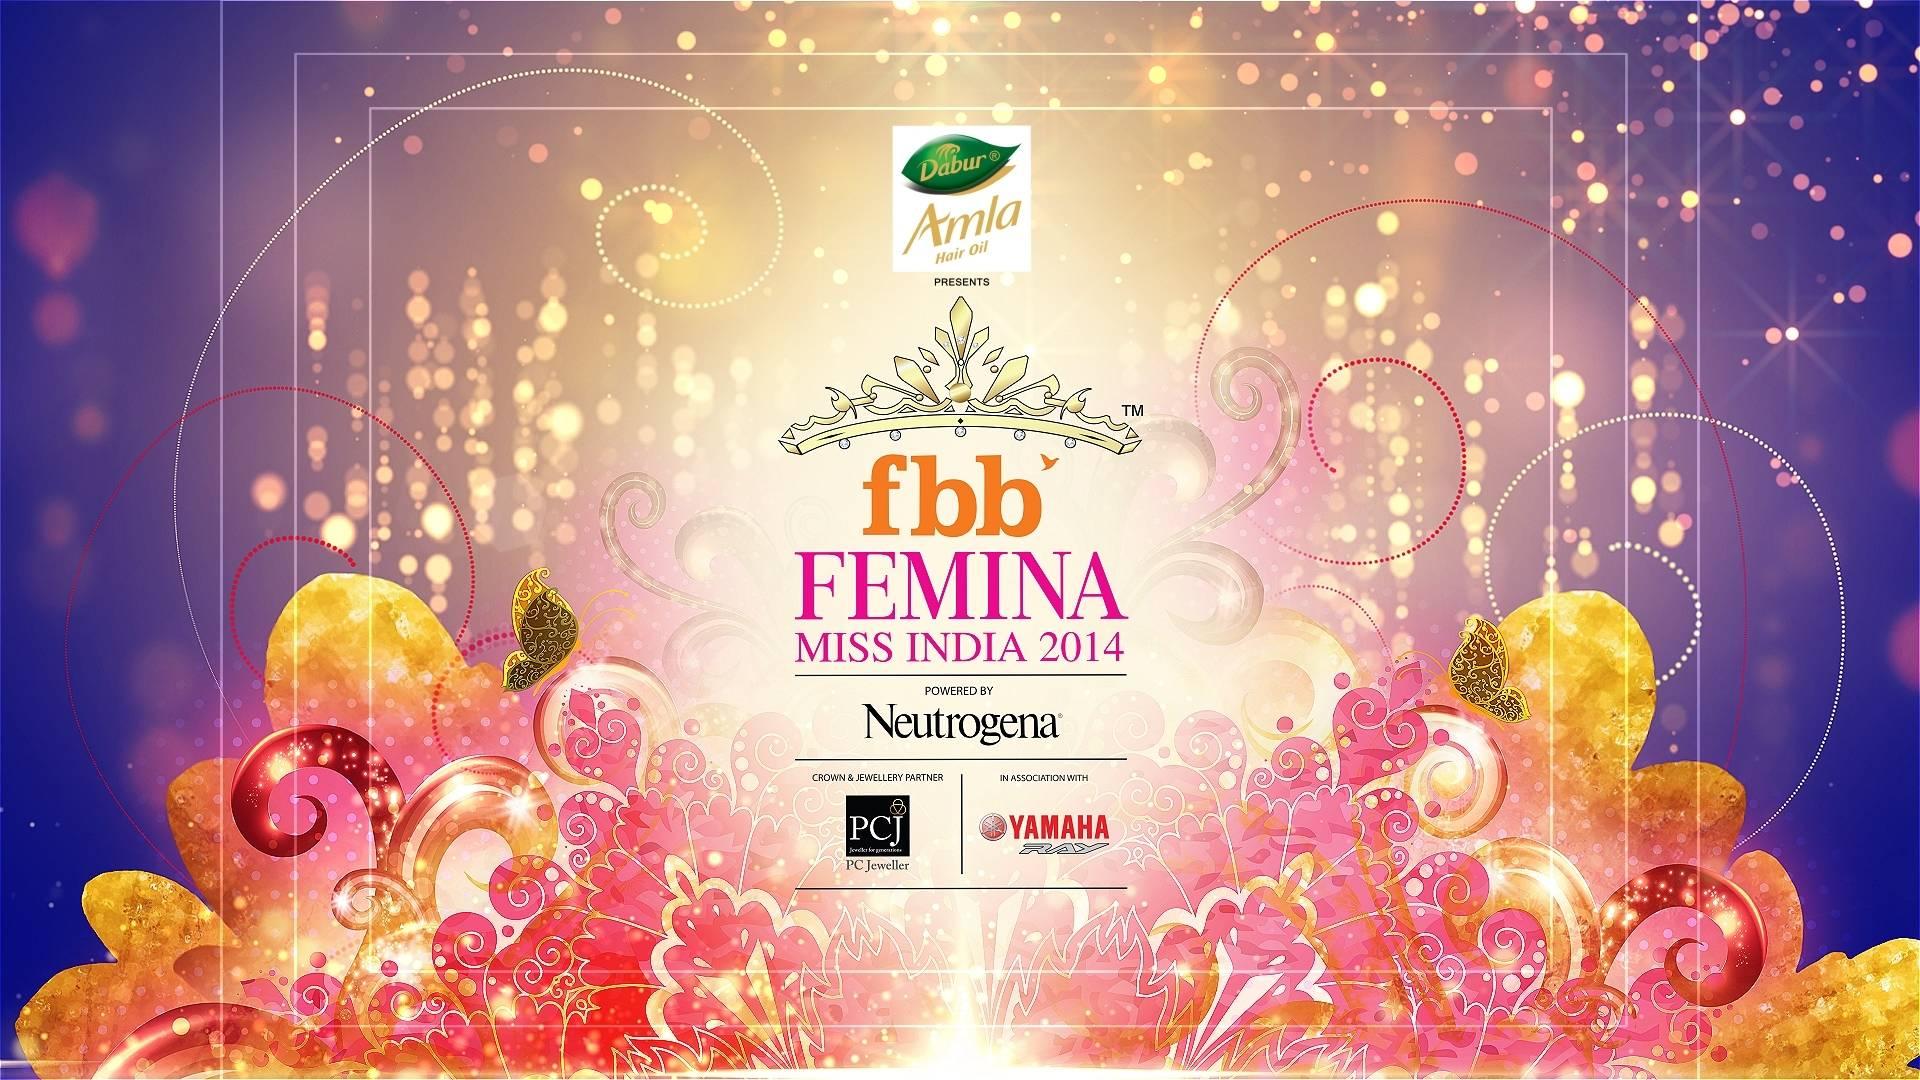 Dabur Amla Femina Miss India 2014